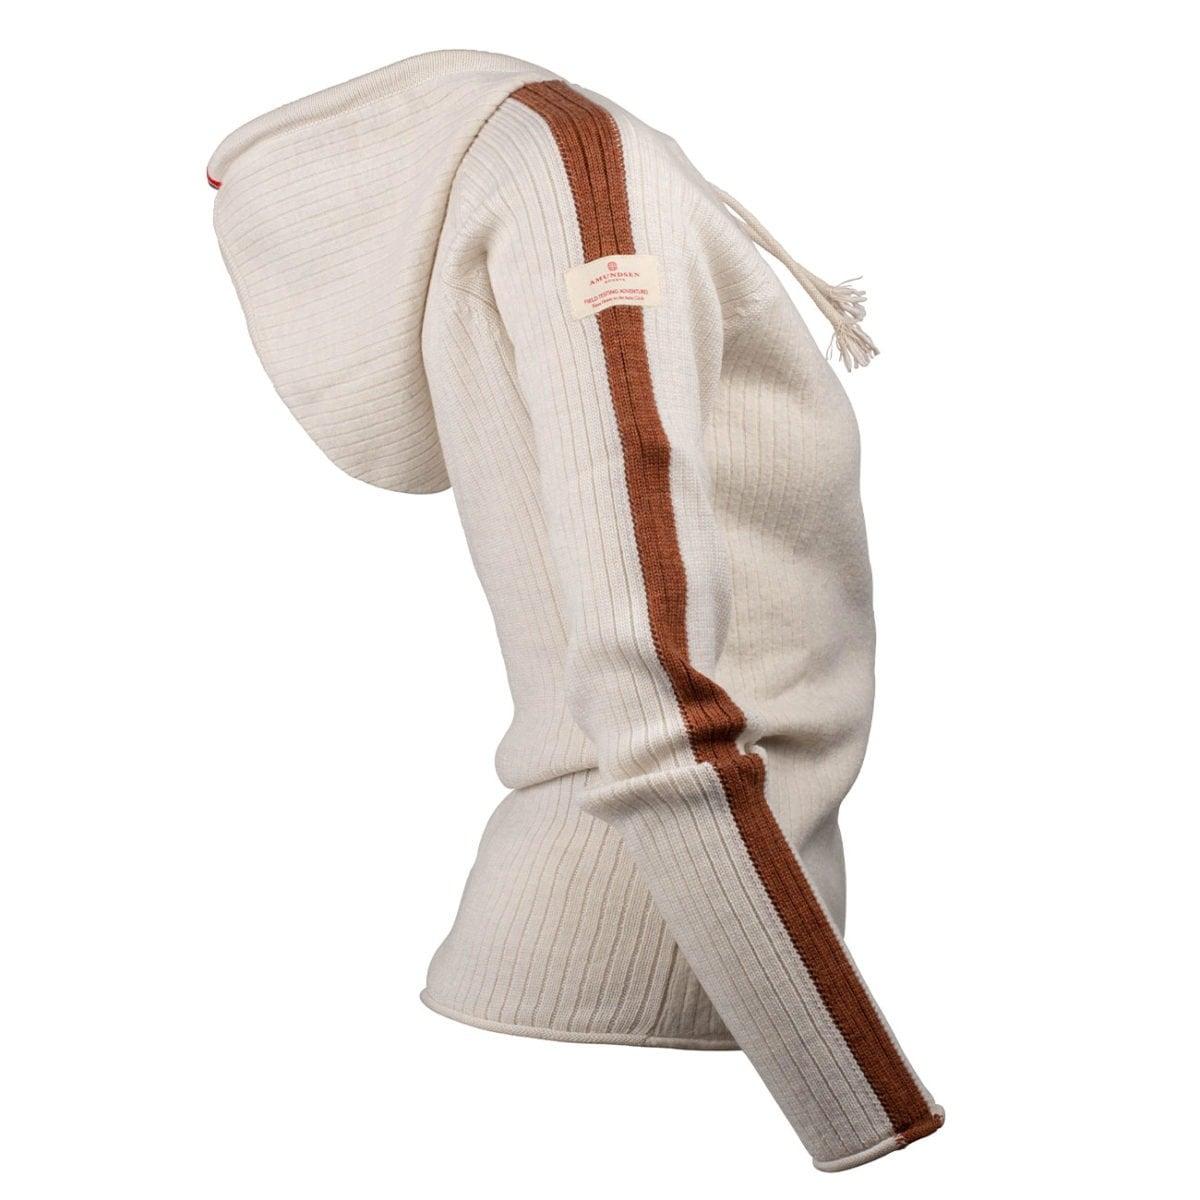 Amundsen Sports Boiled Jacket Stripes, Dame